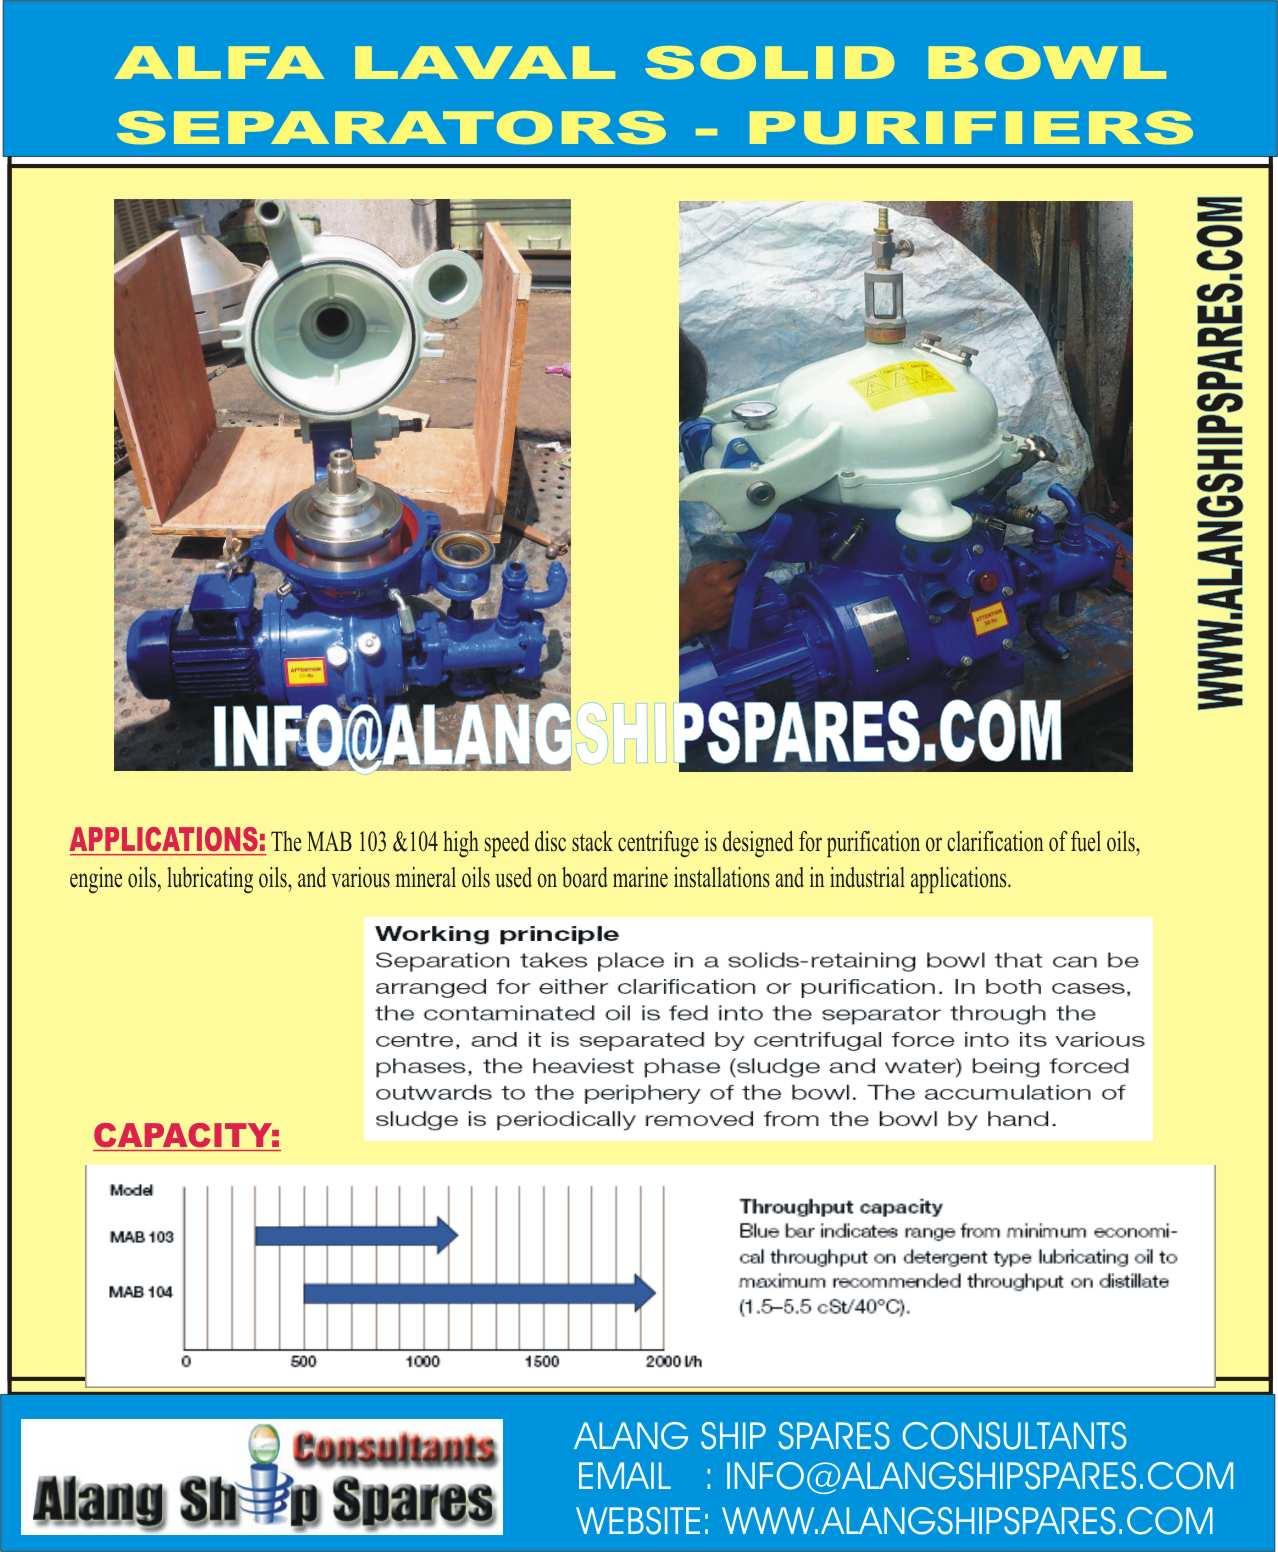 For Sale: Alfa Laval Disc Centrifuge, Industrial centrifuge